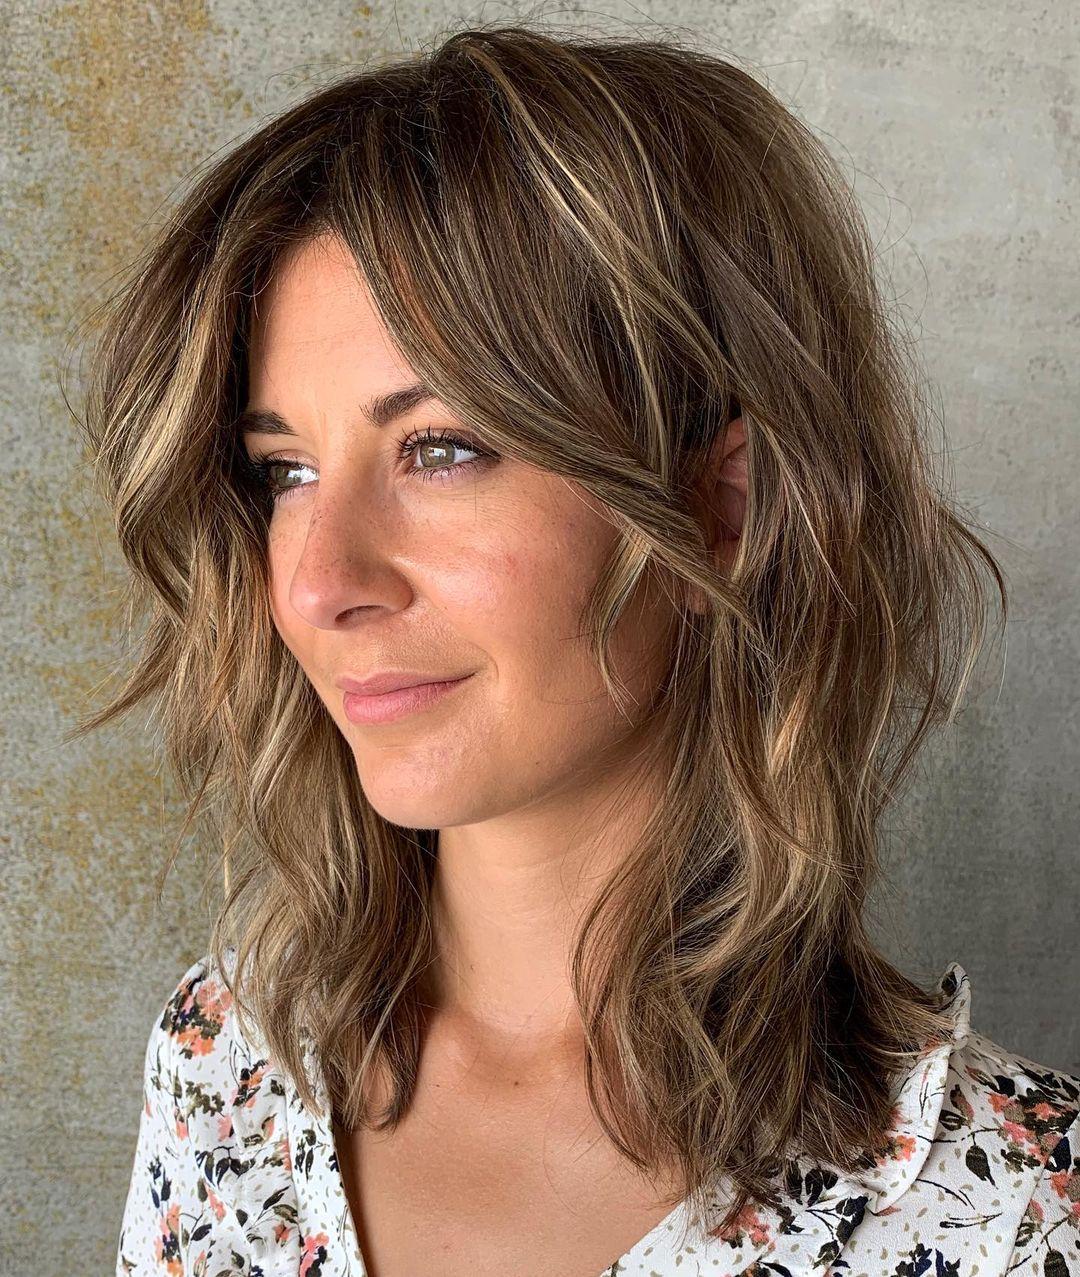 Messy Cut for Medium-Length Hair